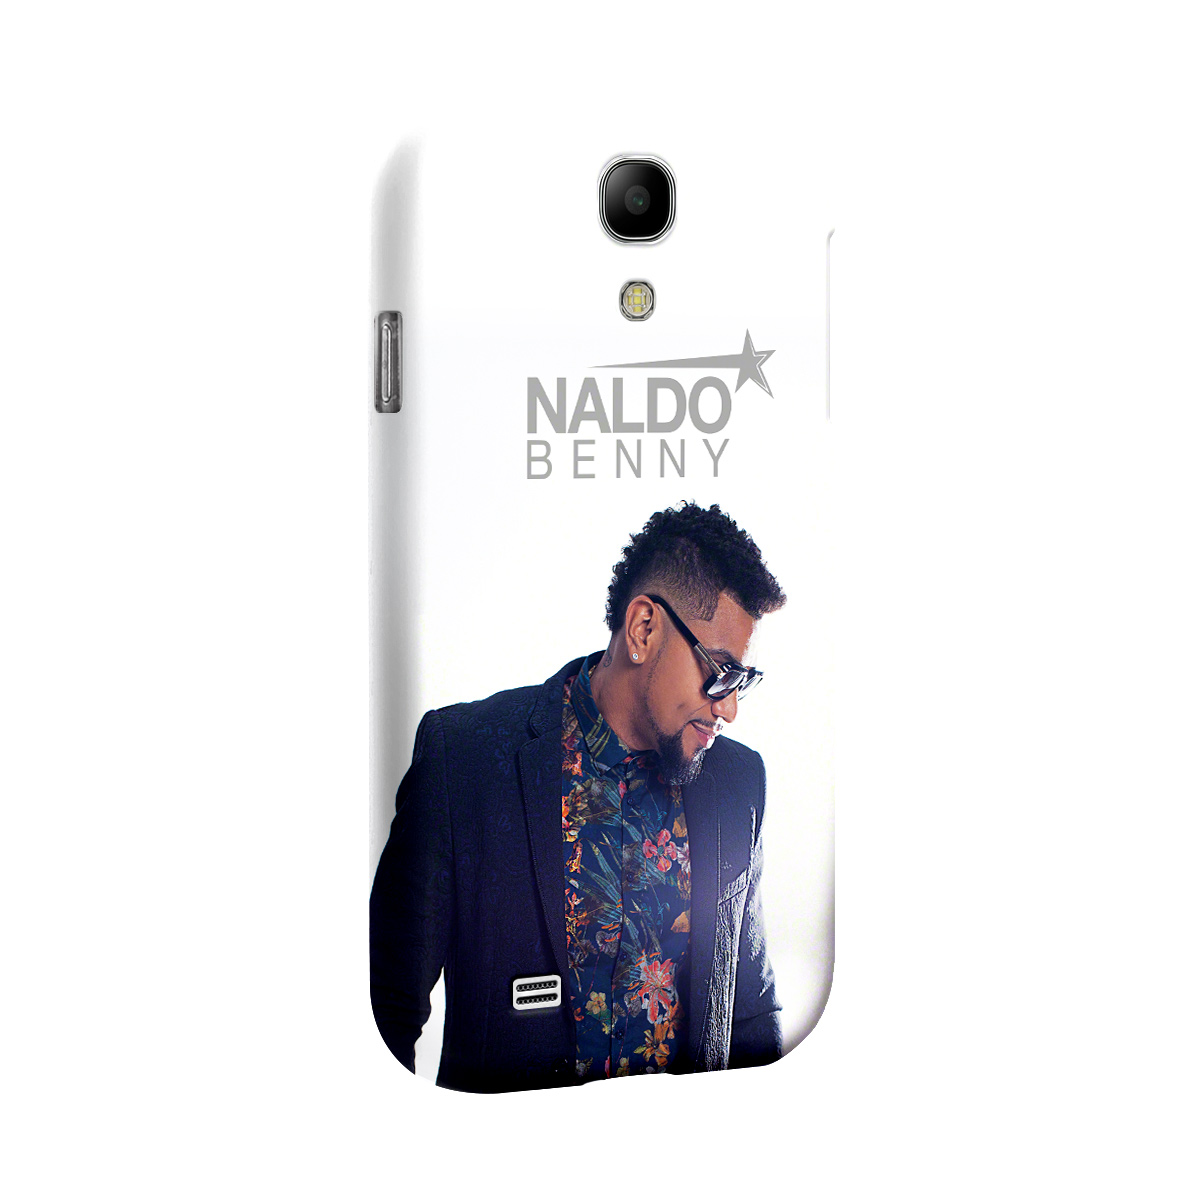 Capa para Samsung Galaxy S4 Naldo Benny Photo